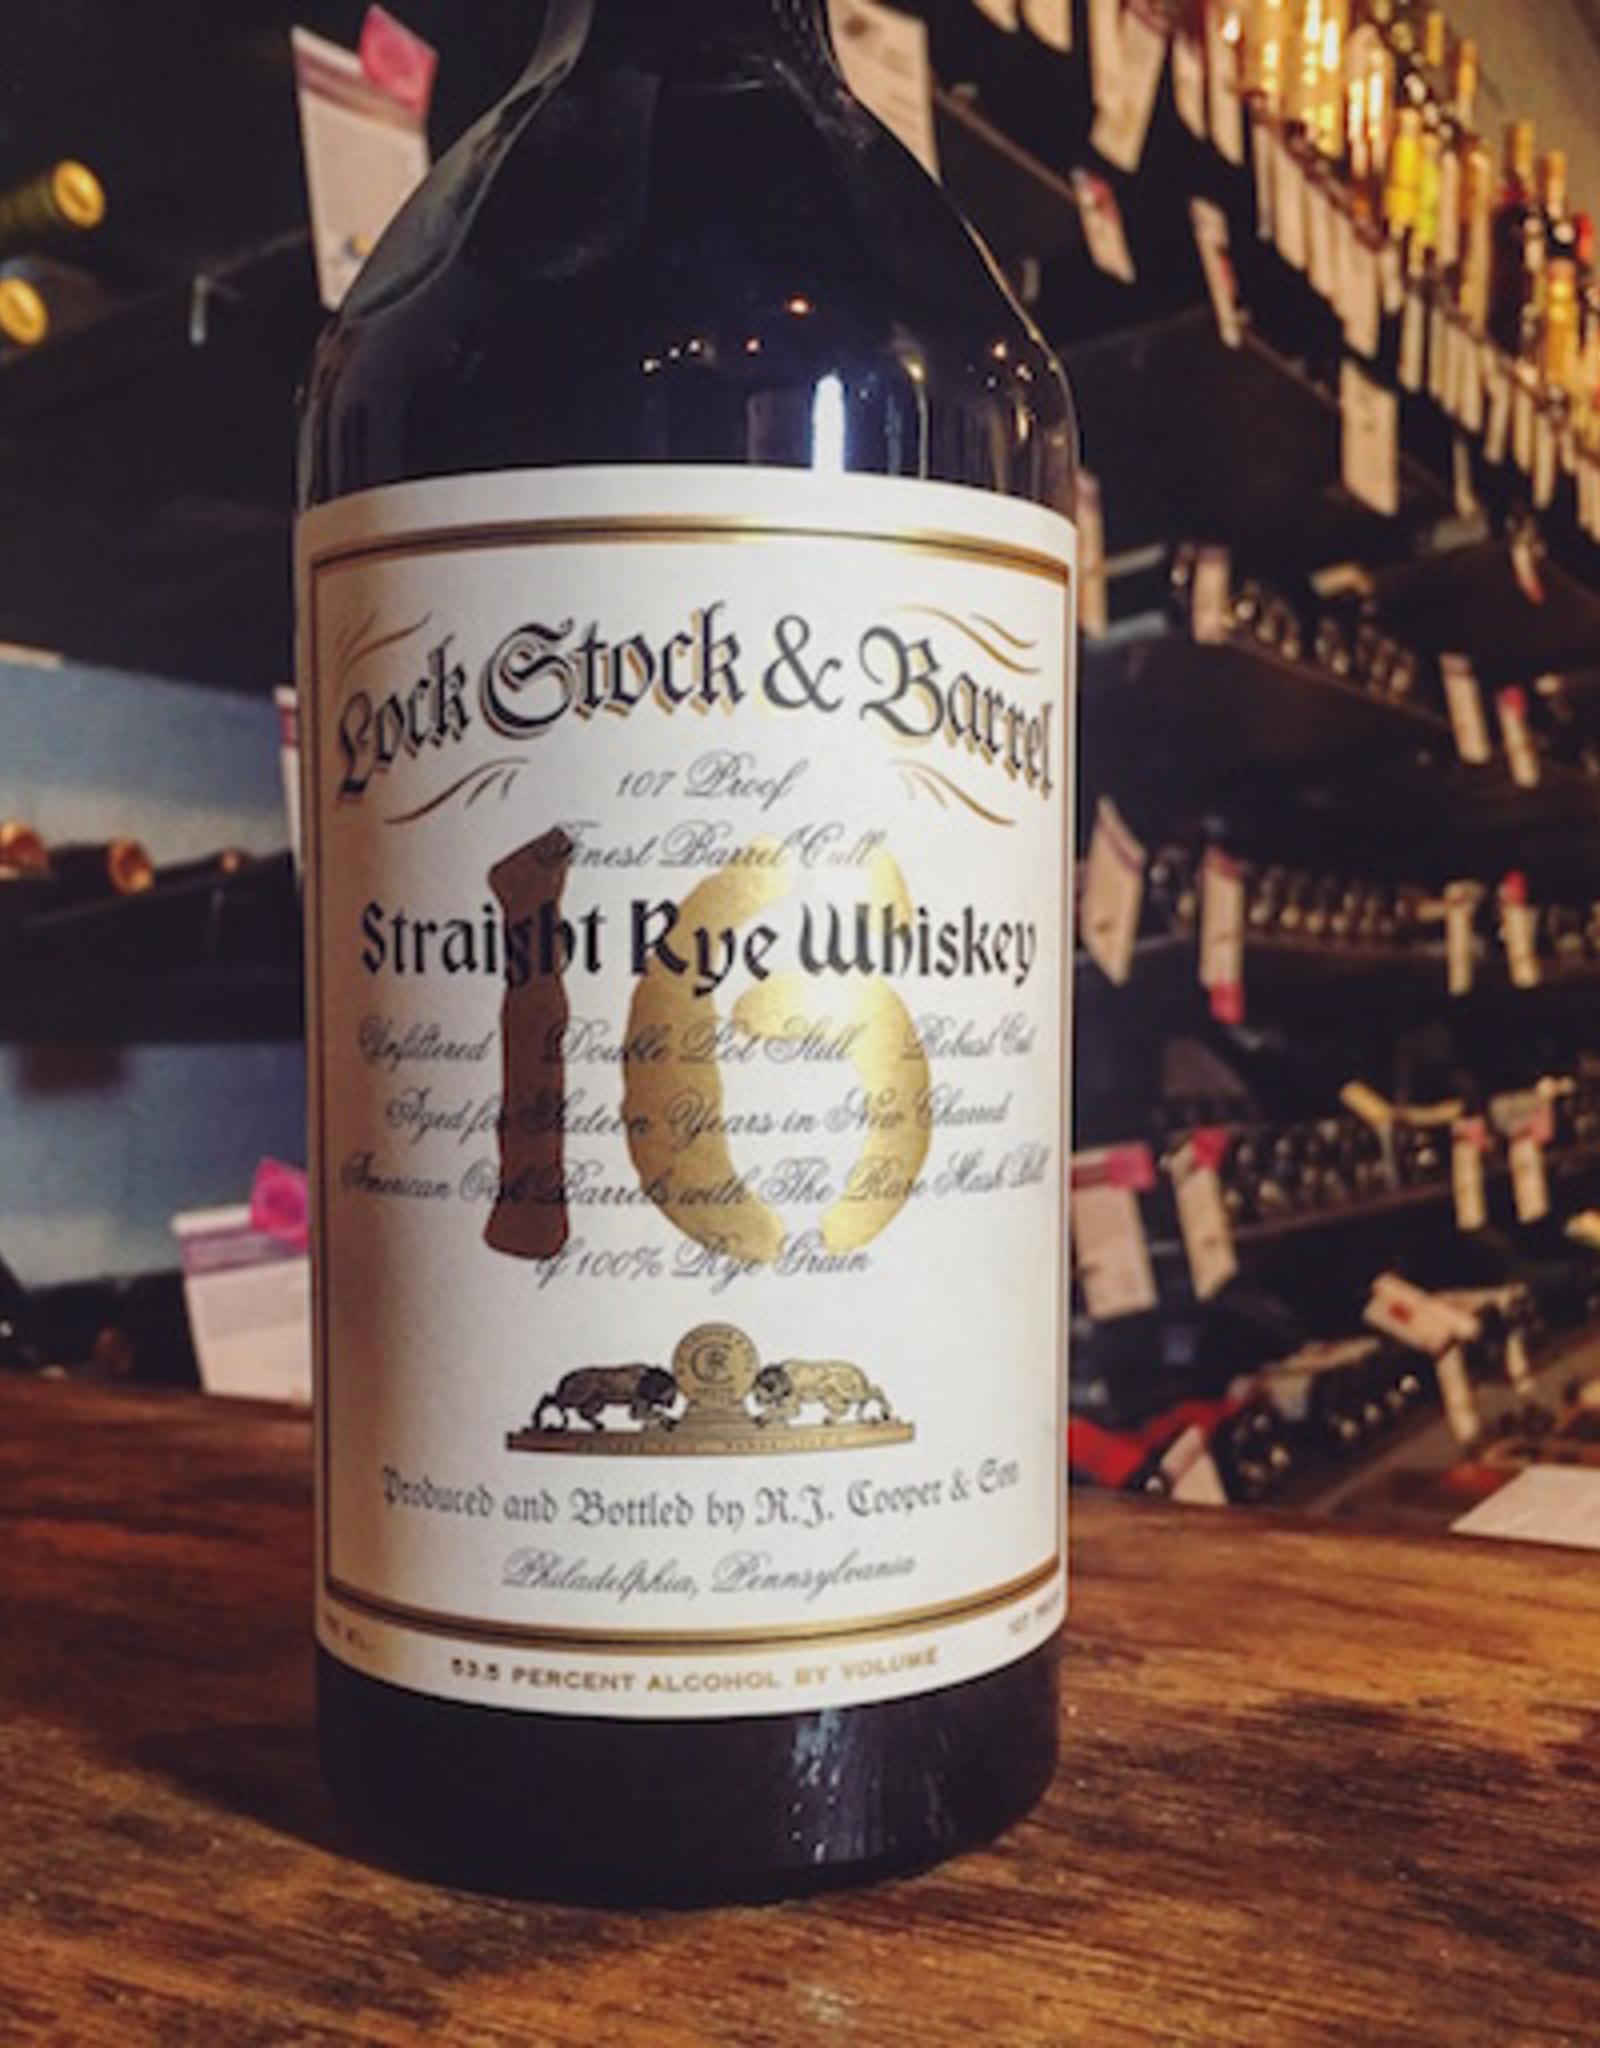 RJ Cooper & Son 'Lock Stock & Barrel' 16yr Straight Rye Whiskey - Philadelphia, PA (750ml)